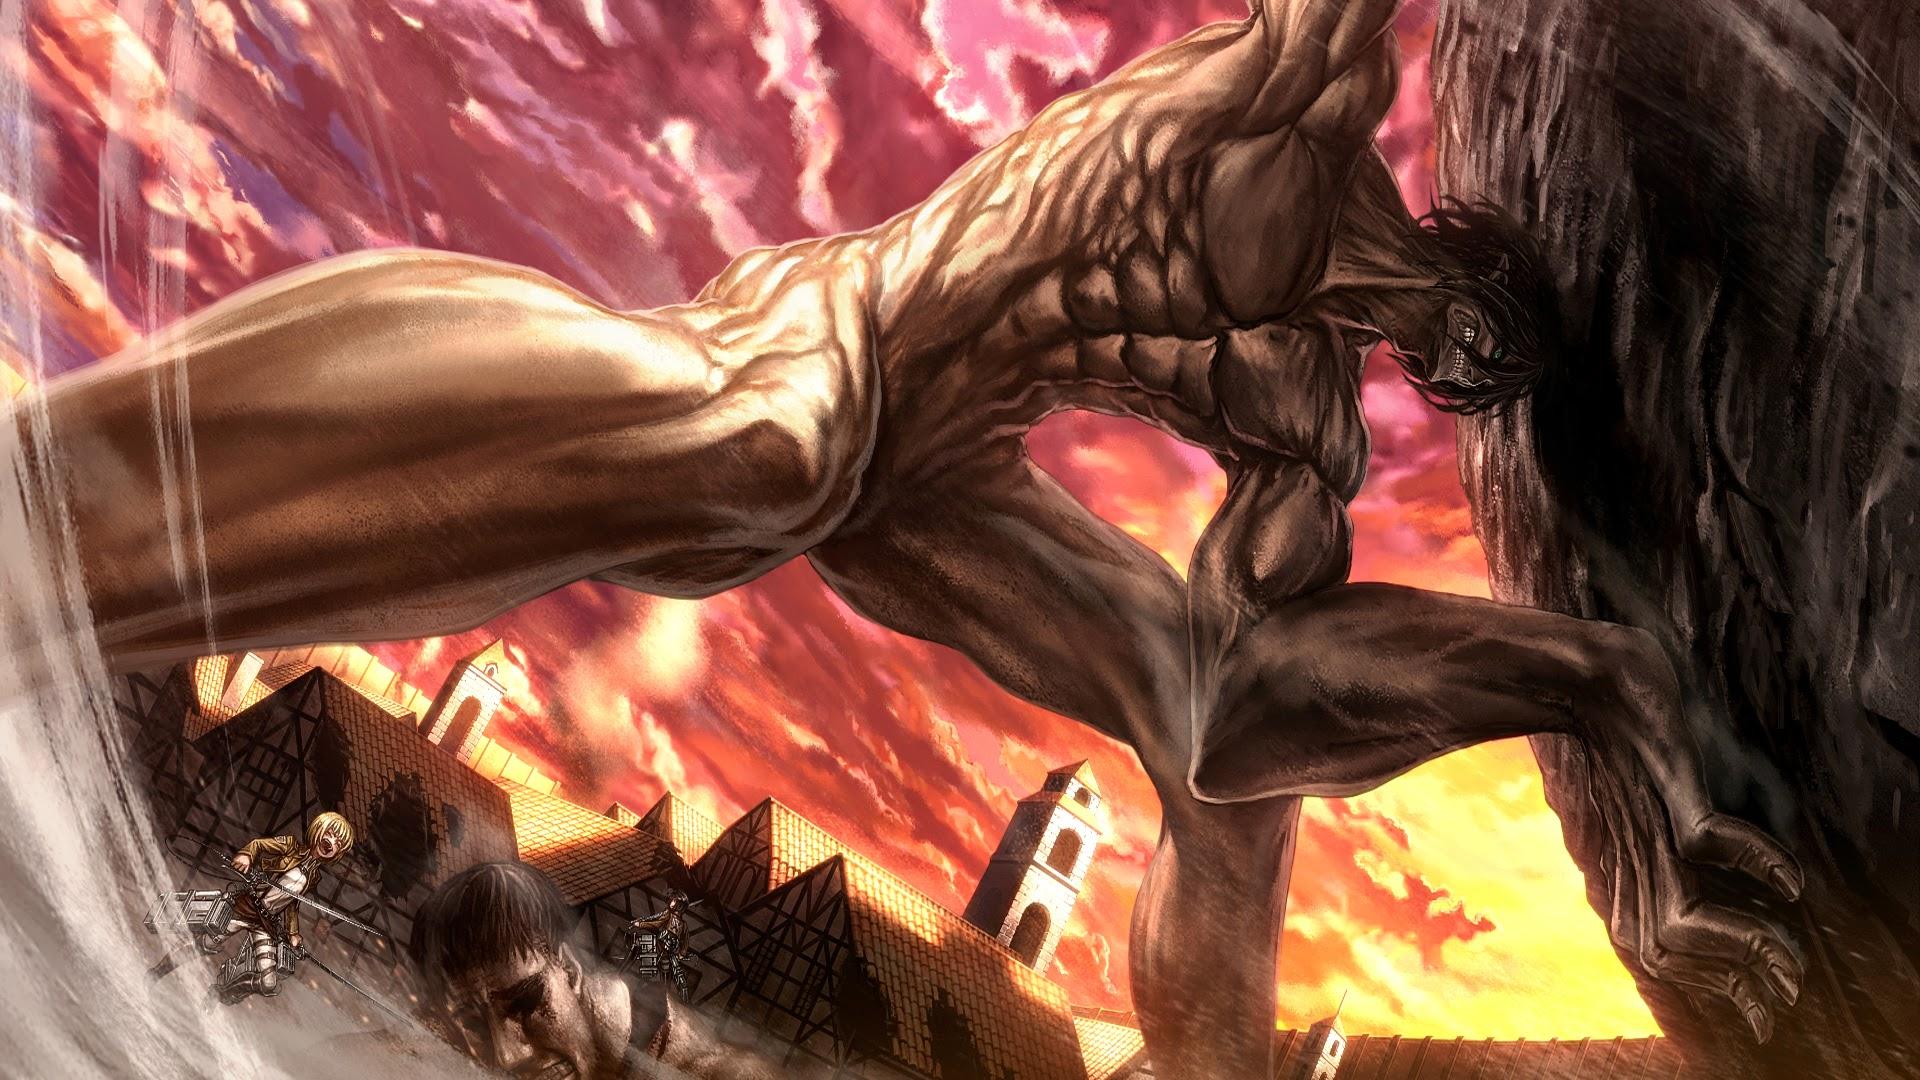 rogue titan attack on titan shingeki no kyojin anime hd wallpaper 1920x1080